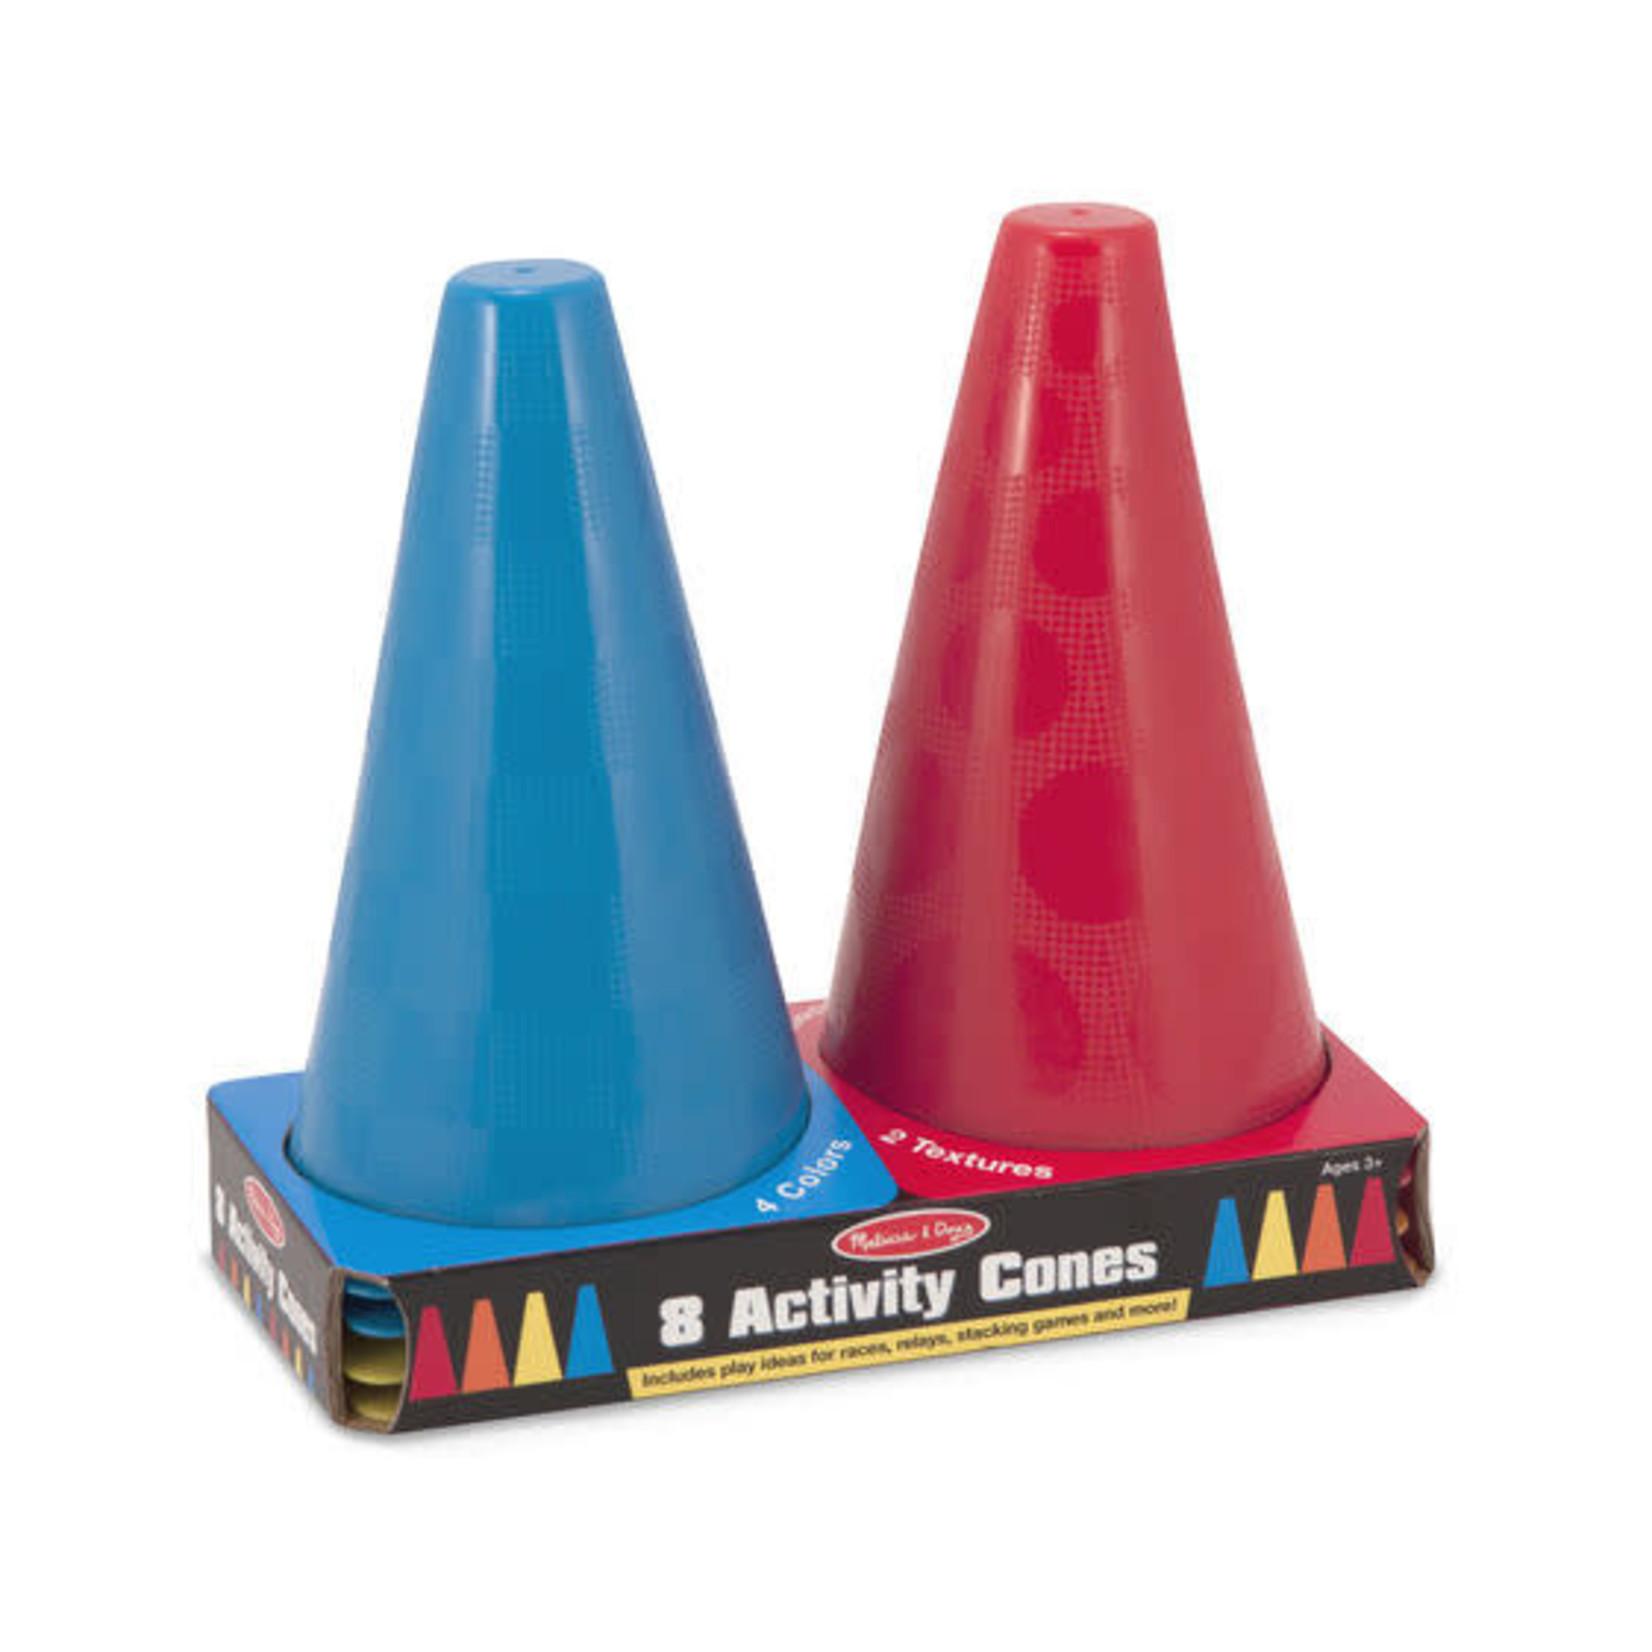 Melissa & Doug Set of 8 Activity Cones